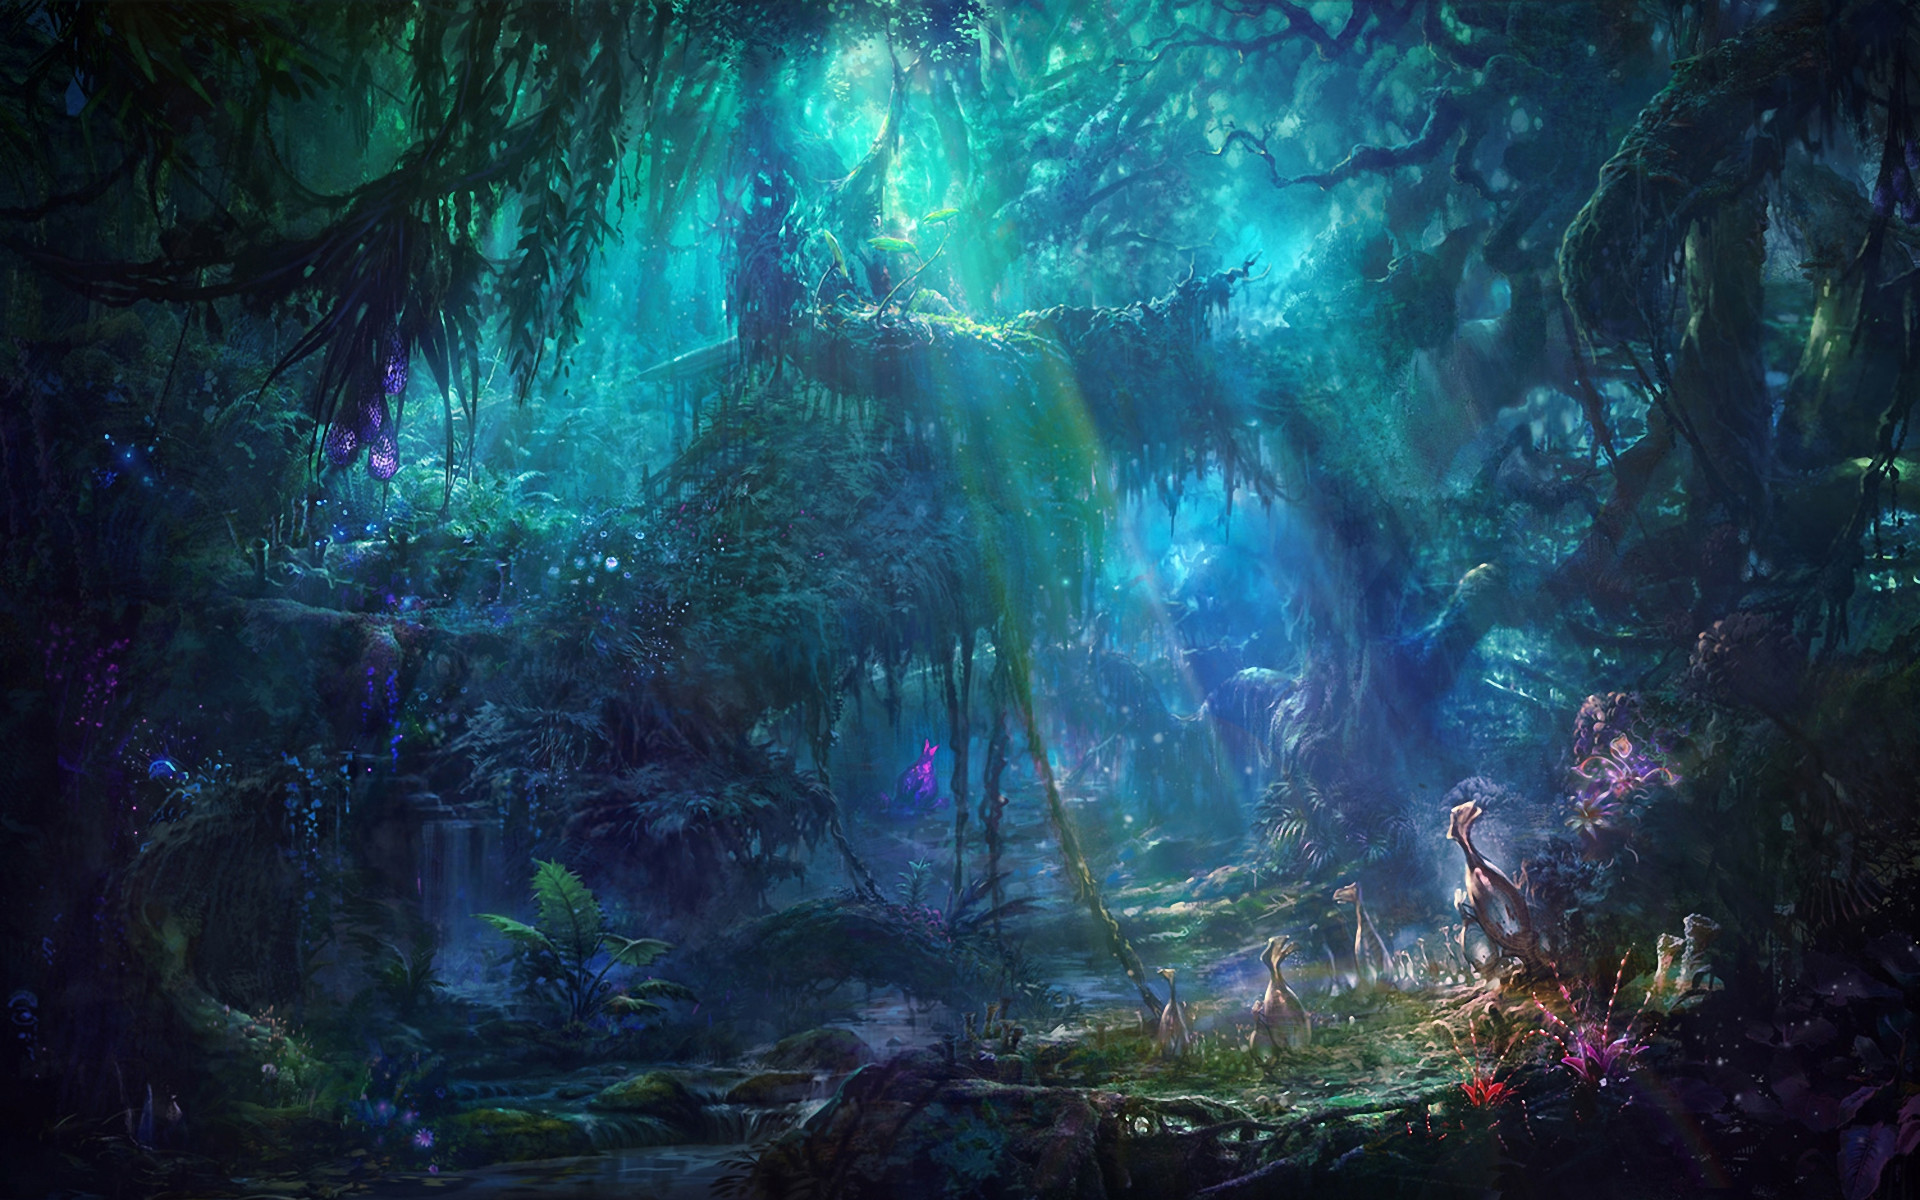 Fantasy Landscape Wallpaper/Background 1920 x 1200 – Id: 269793 – Wallpaper  Abyss